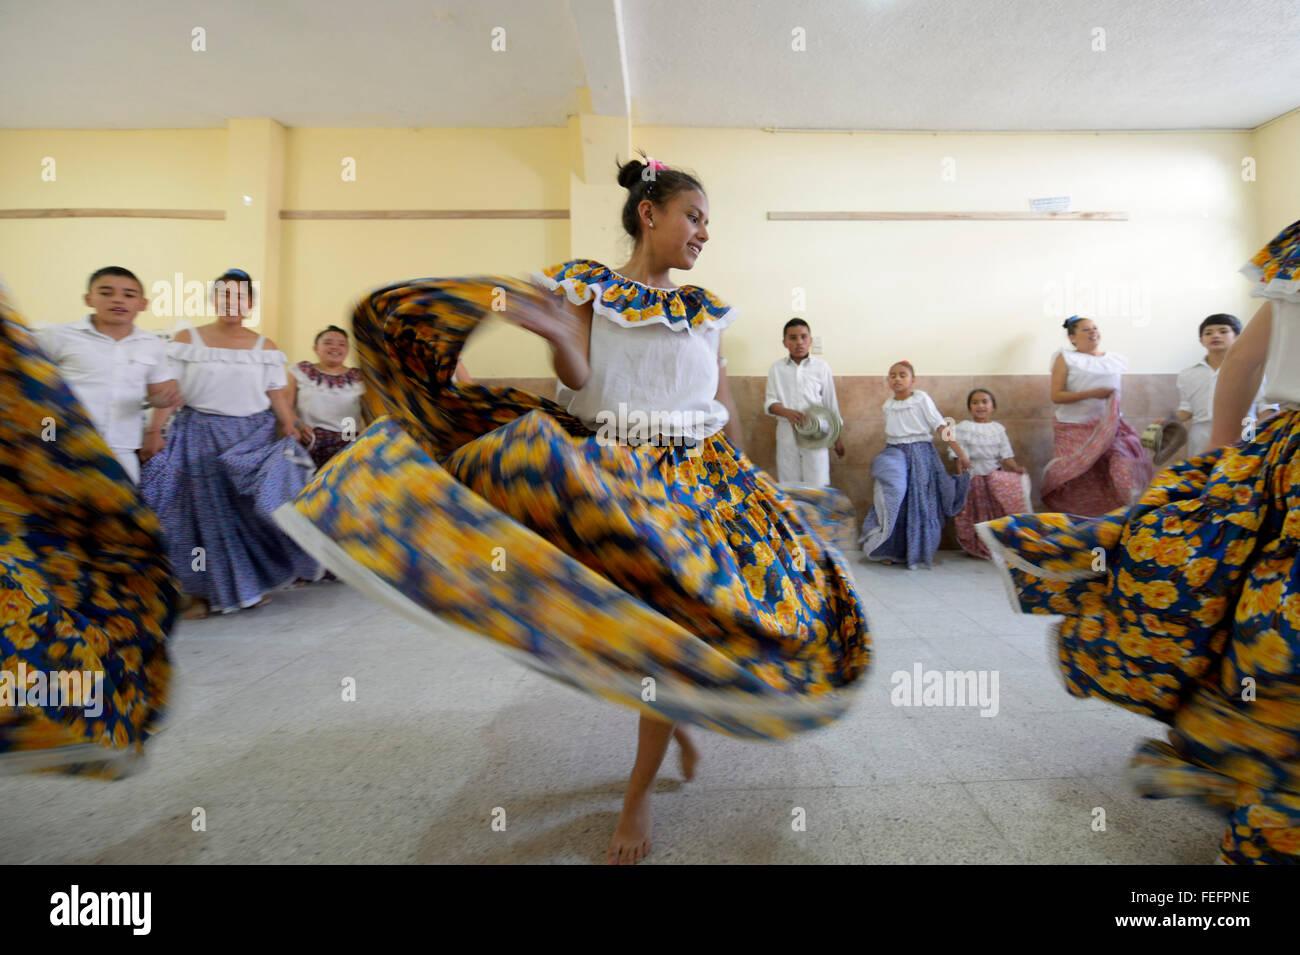 kolumbianische Mädchen tanzen